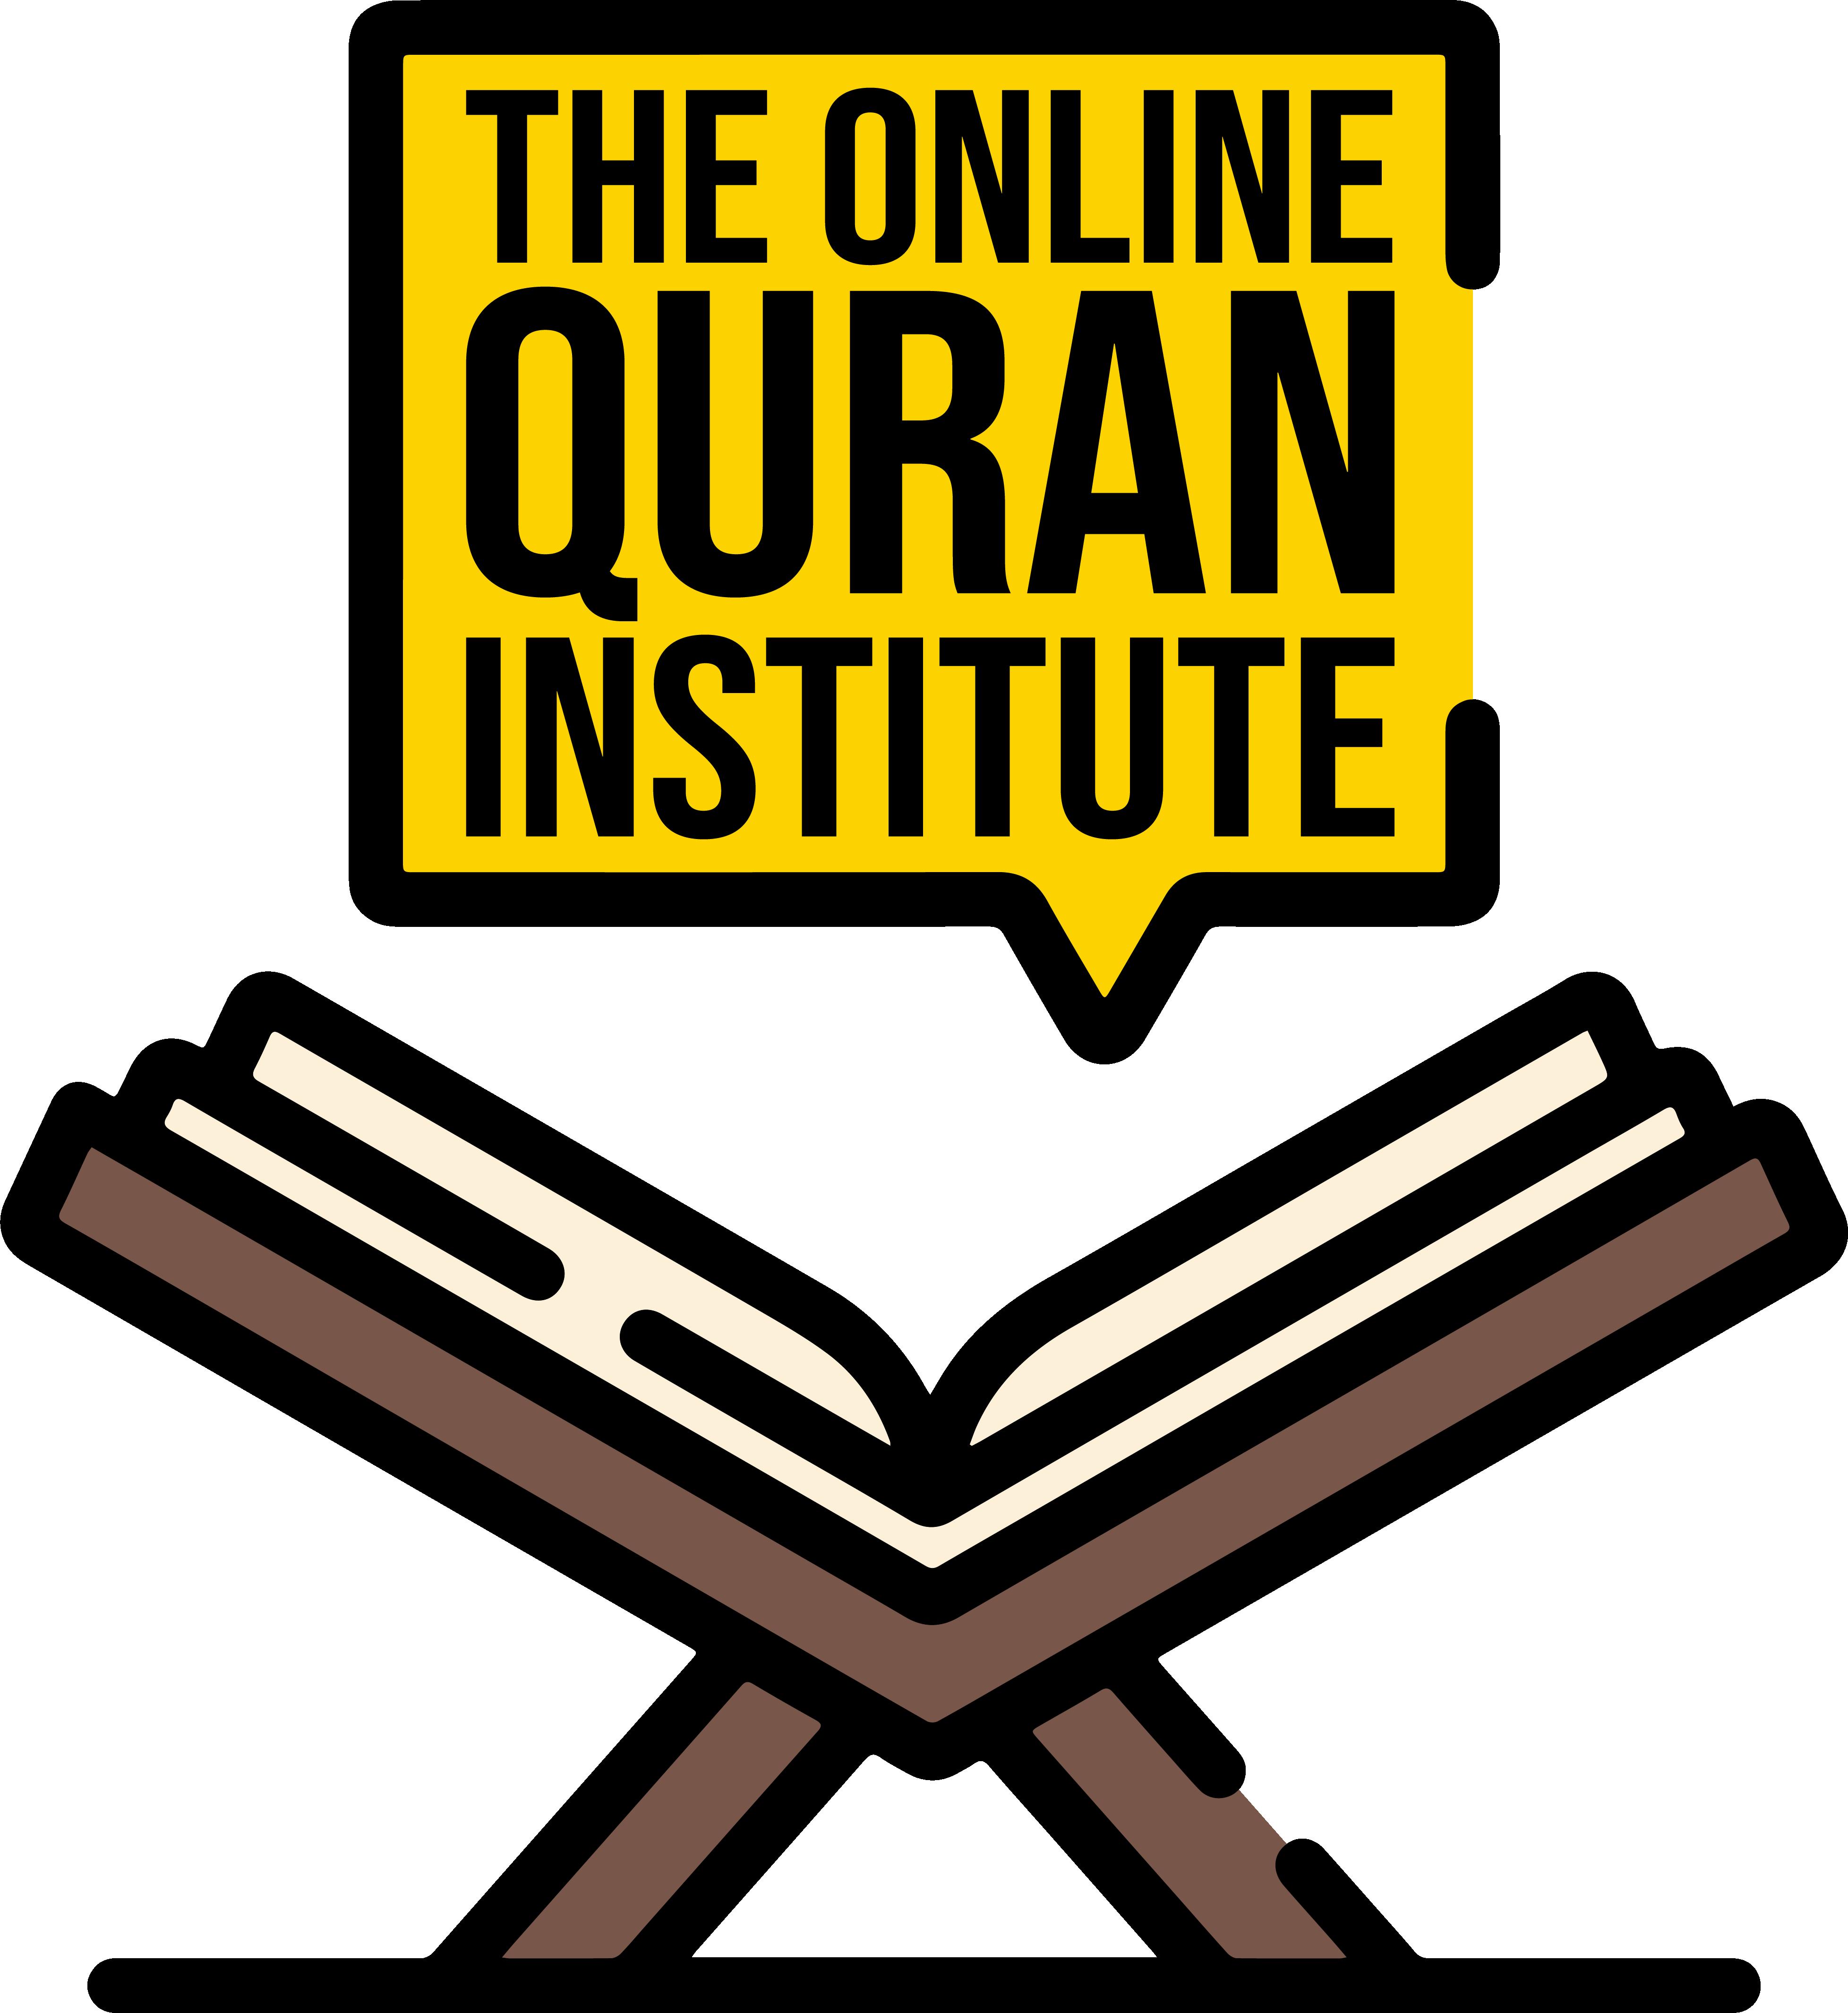 The Online Quran Institue